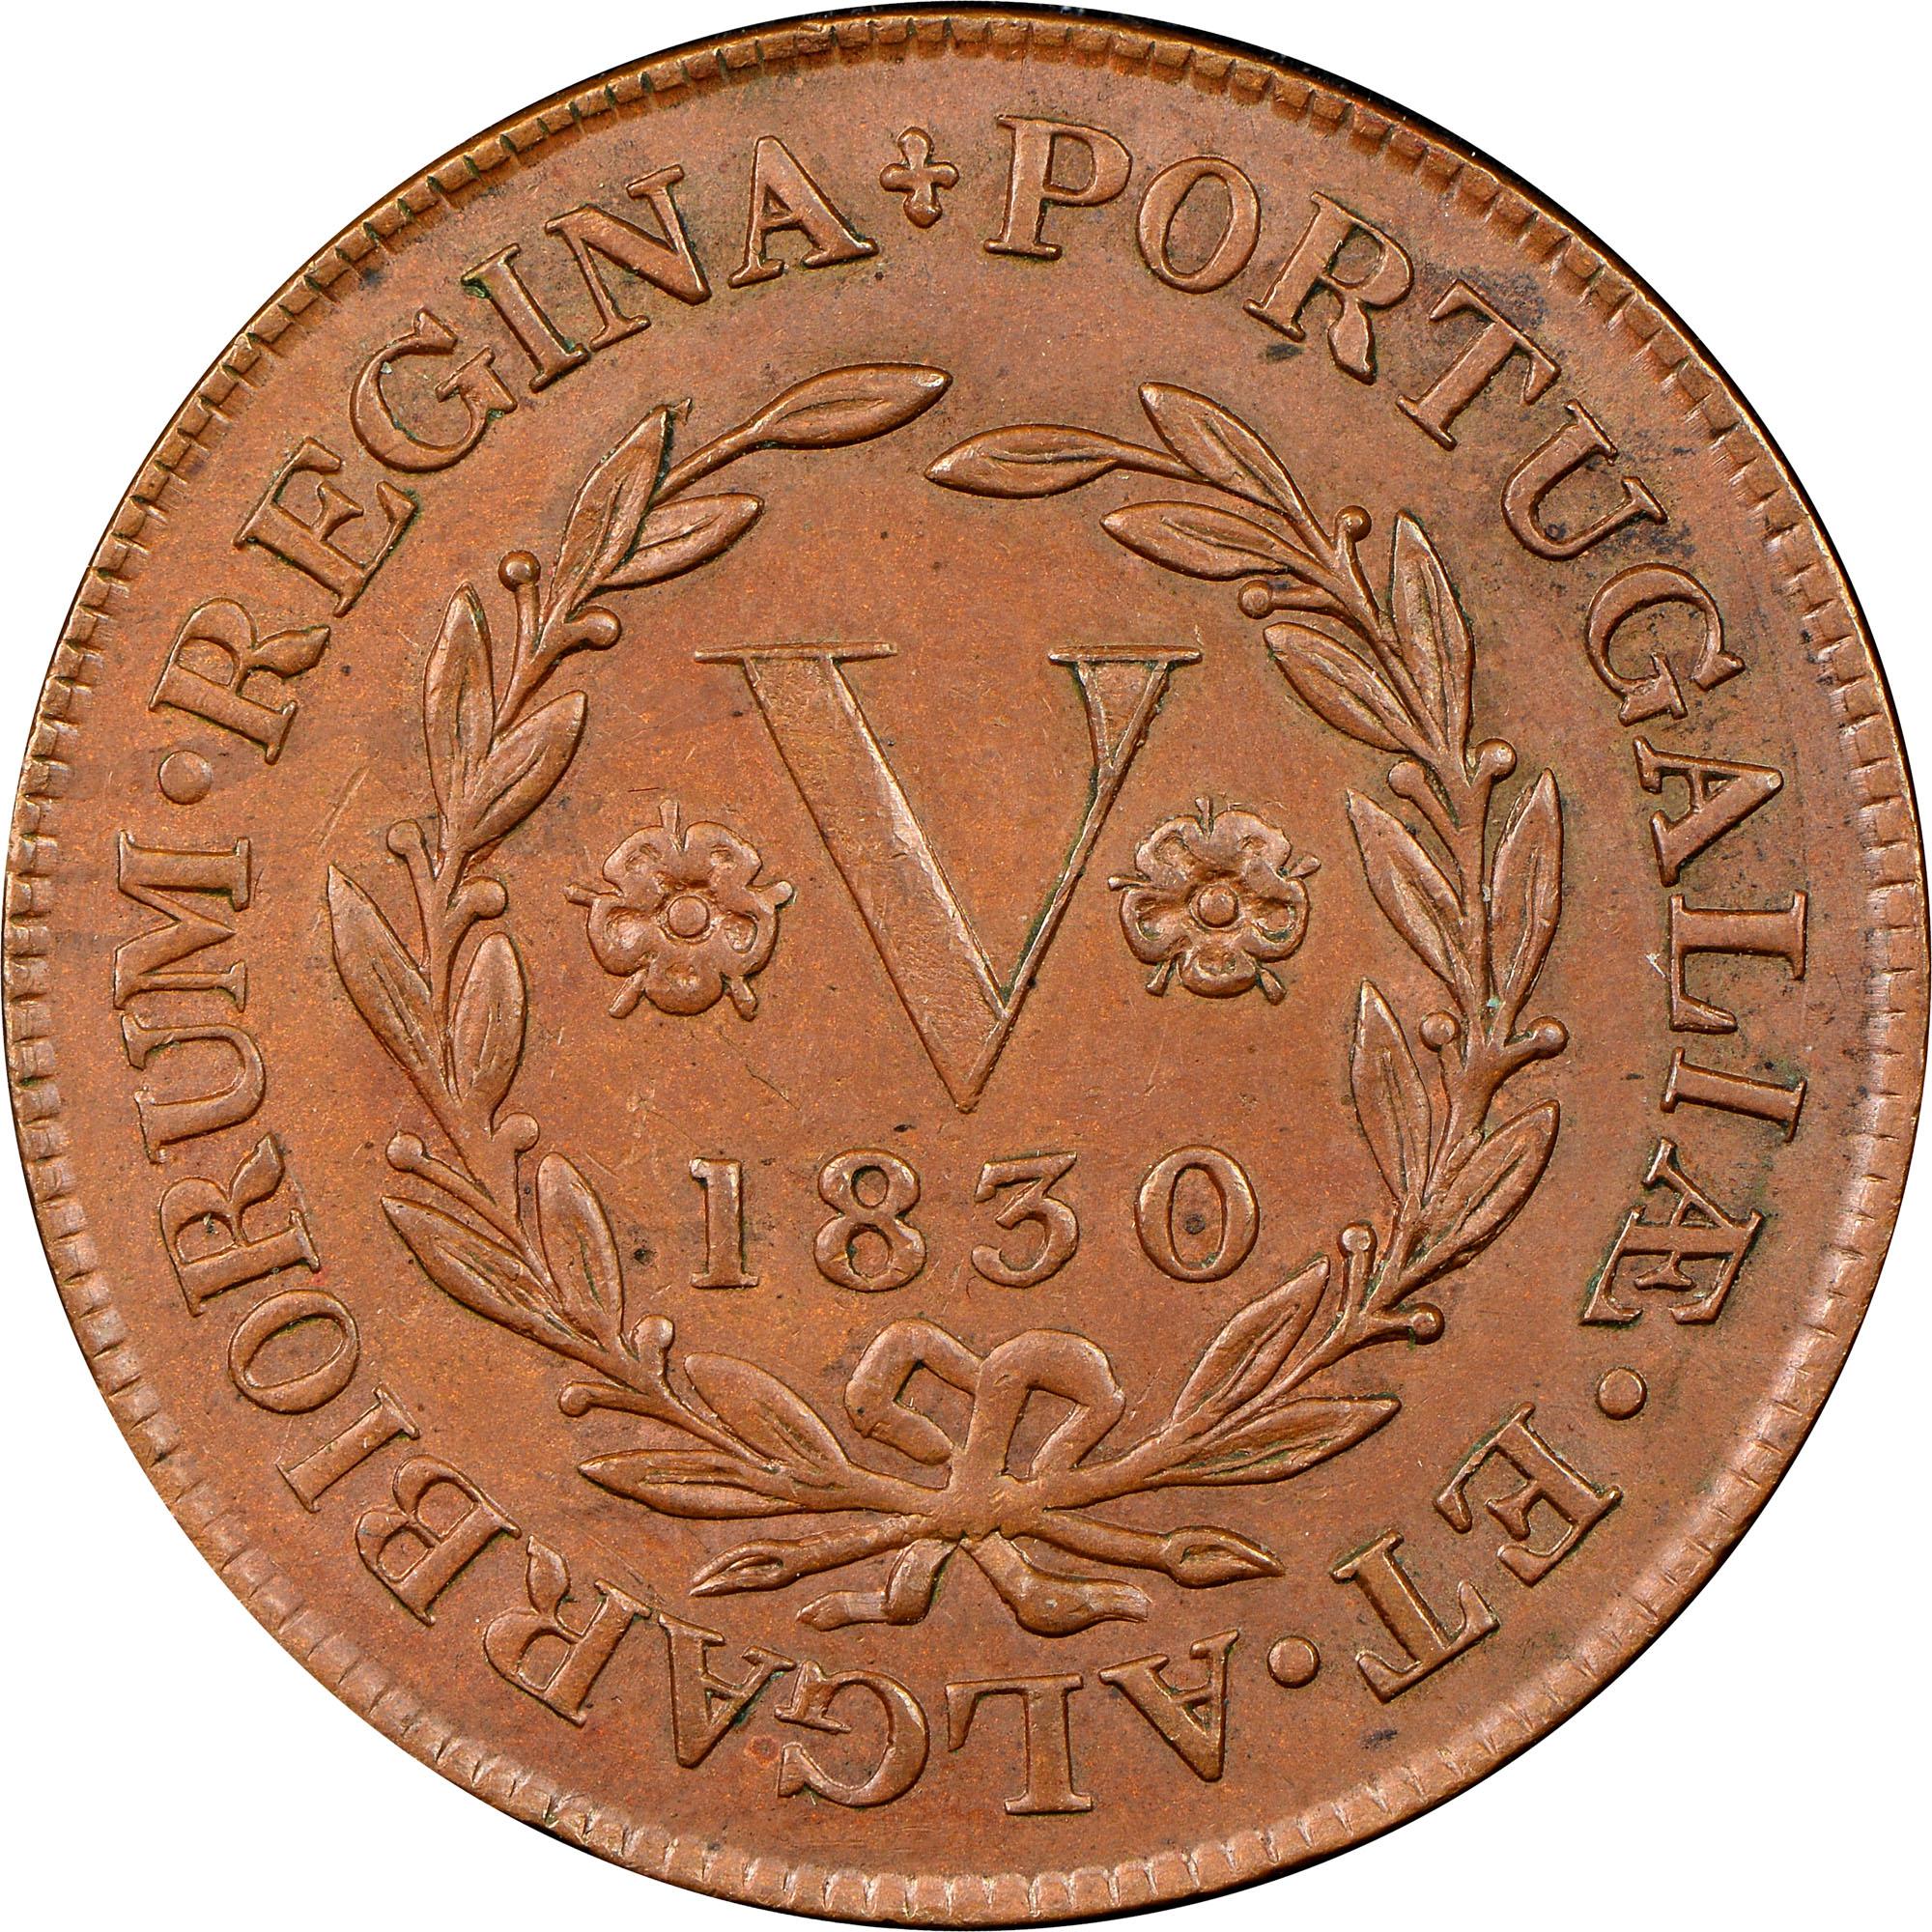 1830 Azores TERCEIRA ISLAND 5 Reis reverse